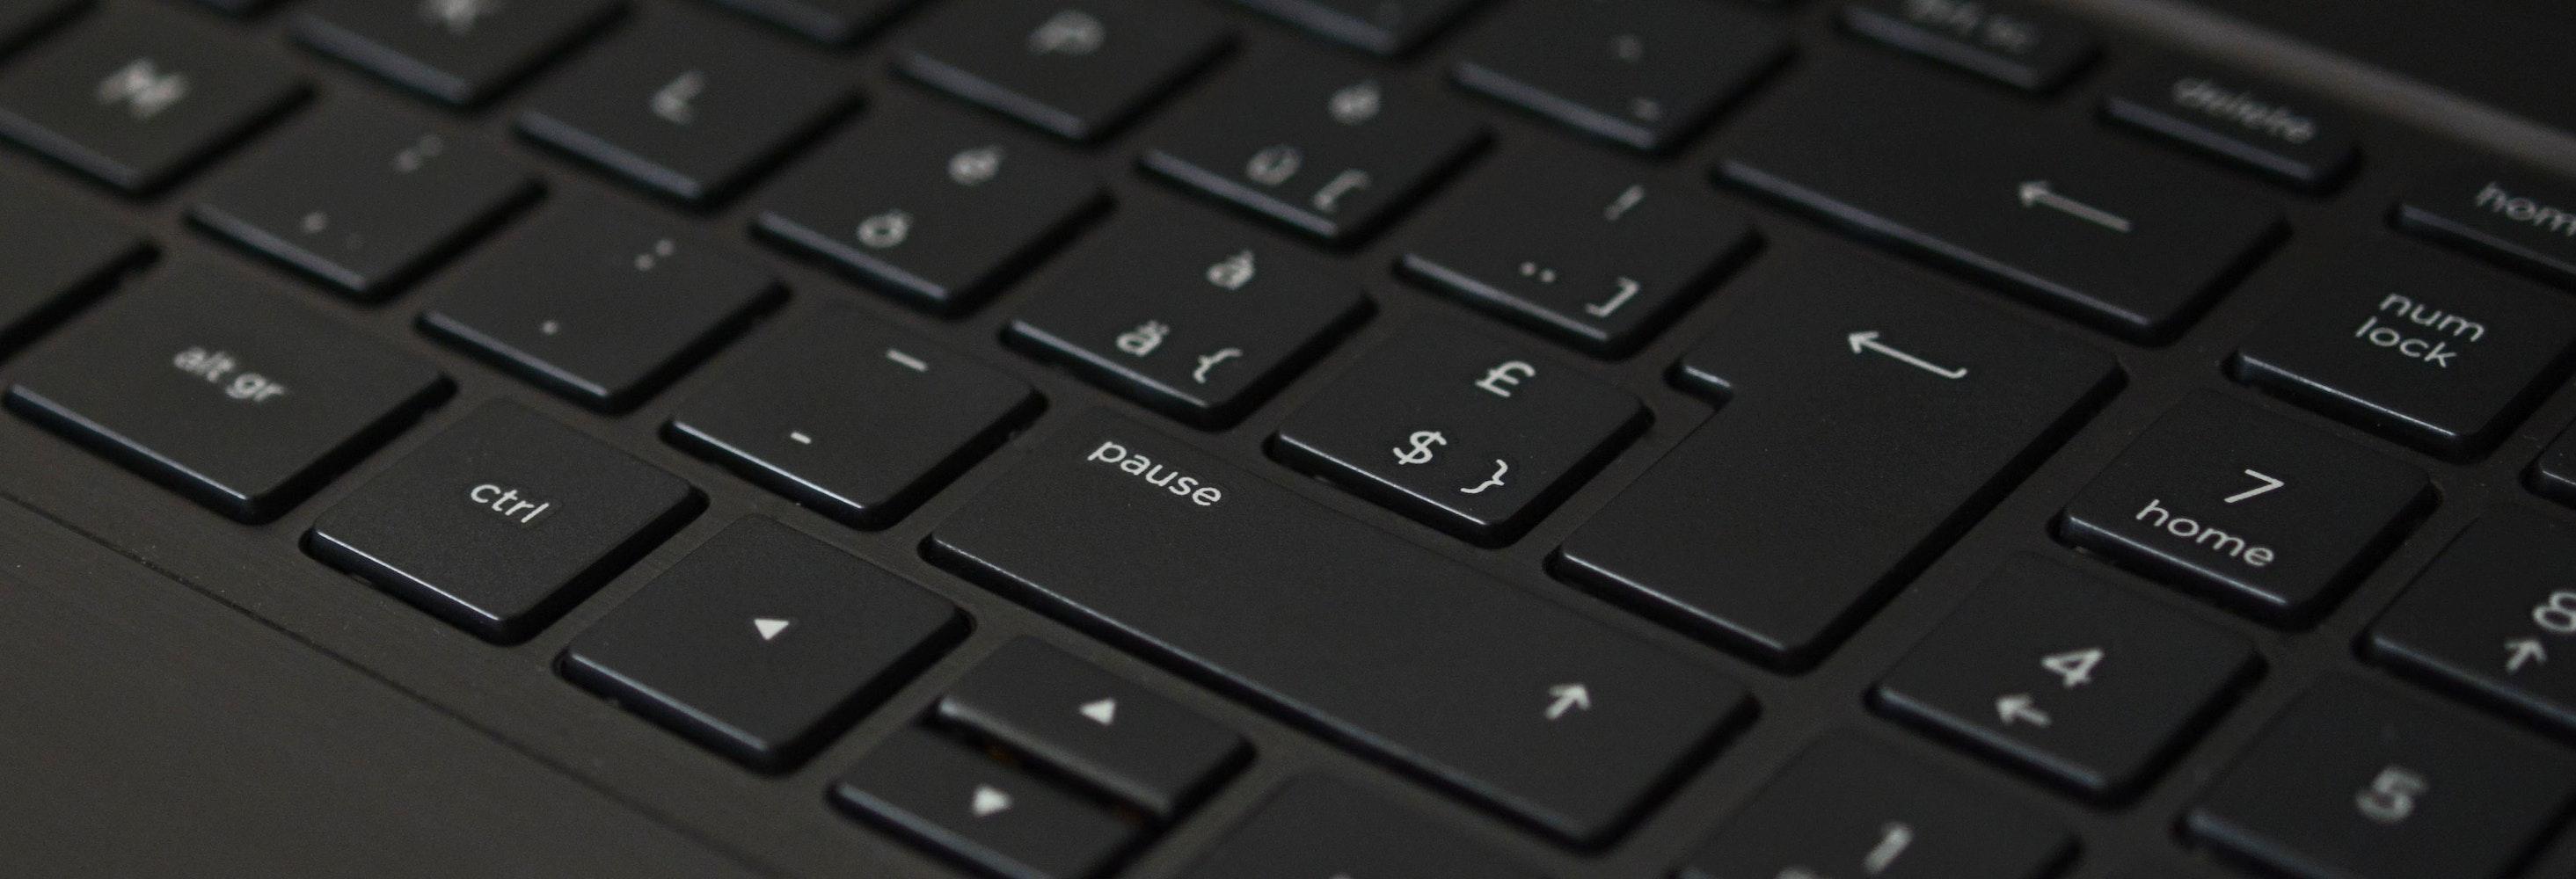 Free Stock Photos Of Keyboard 183 Pexels